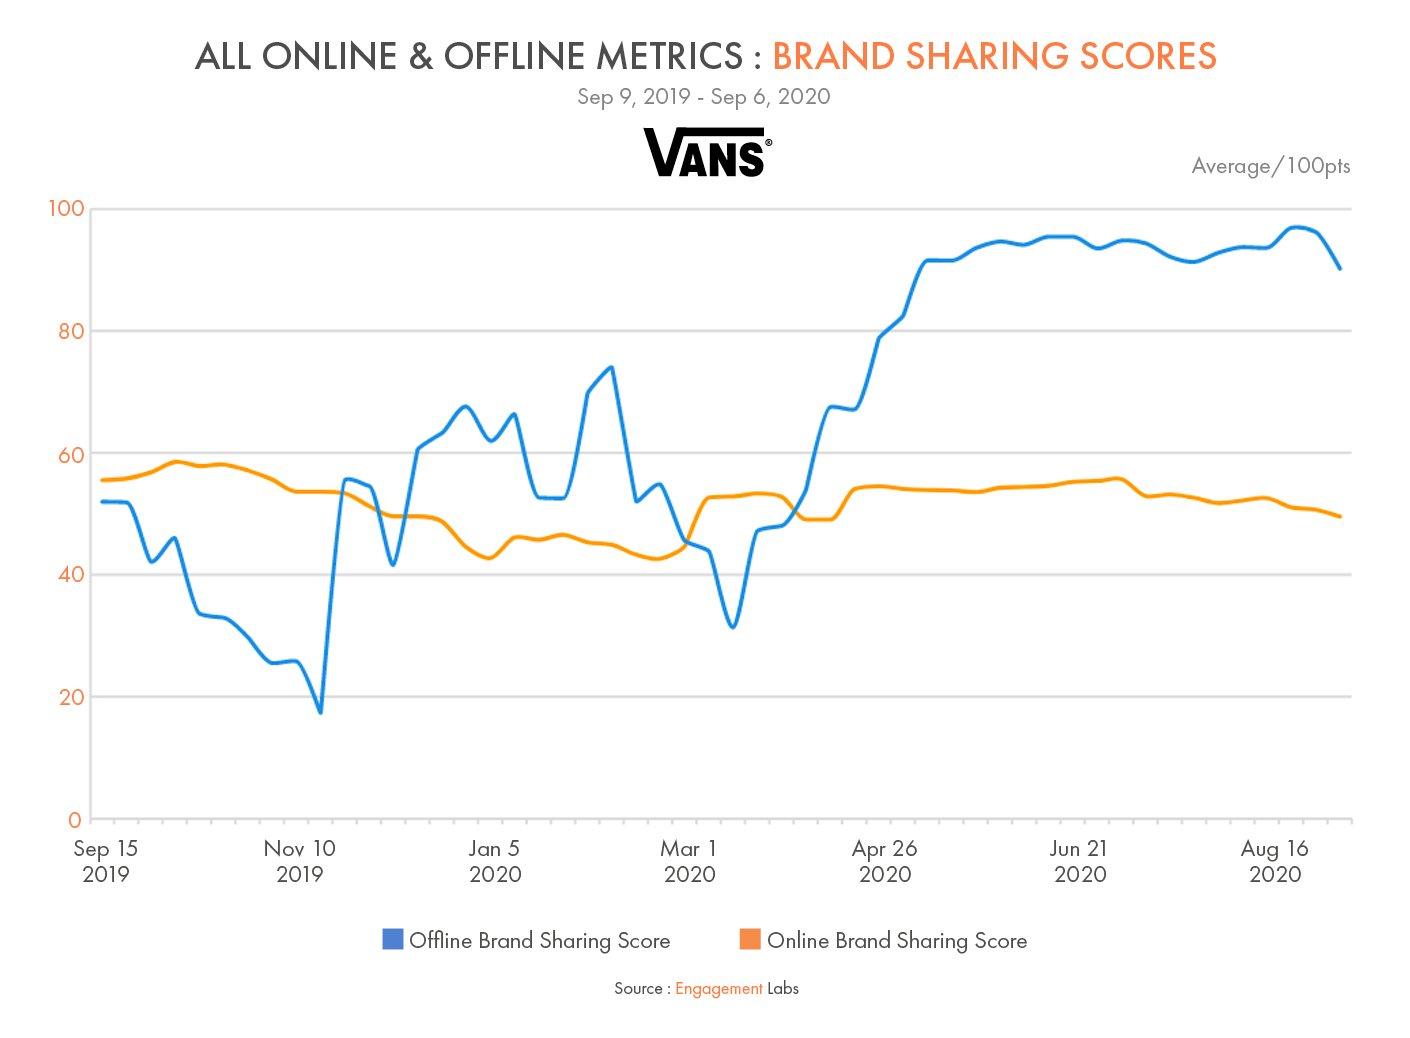 Vans Brand Sharing Scores